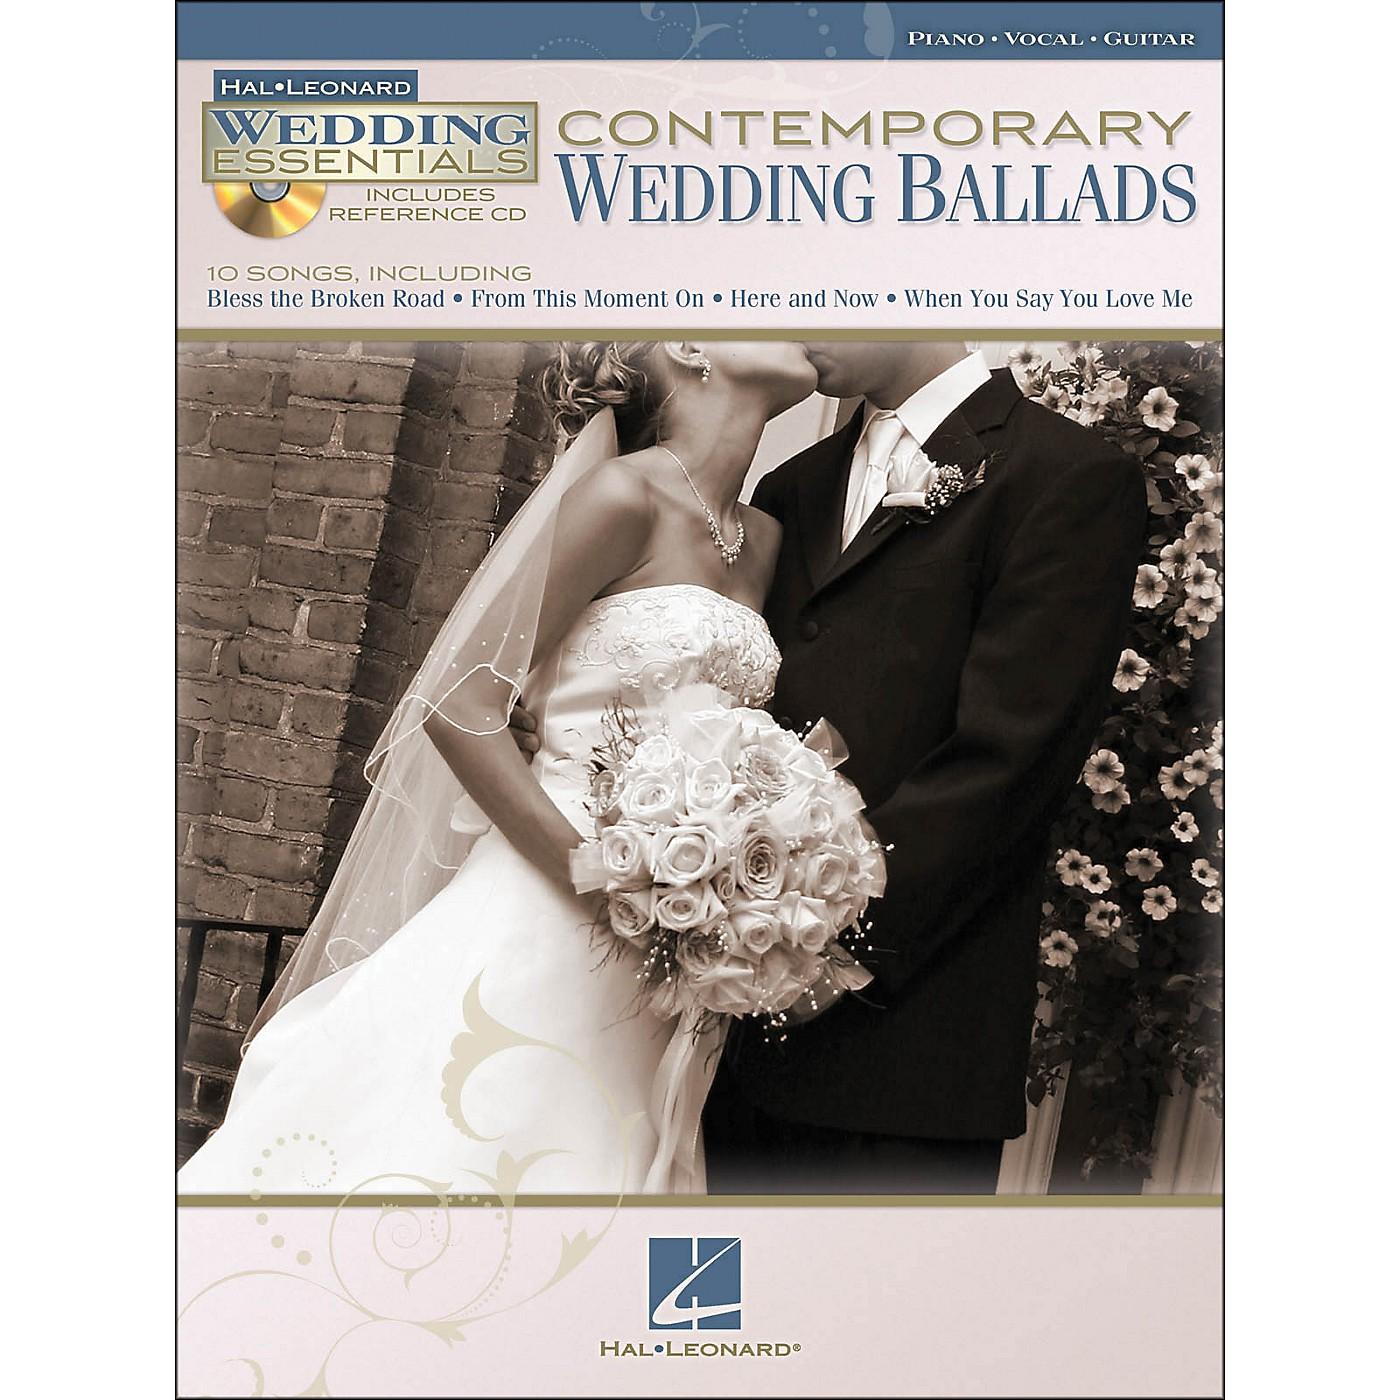 Hal Leonard Contemporary Wedding Ballads - Wedding Essentials Series (Book/CD) arranged for piano, vocal, and guitar (P/V/G) thumbnail